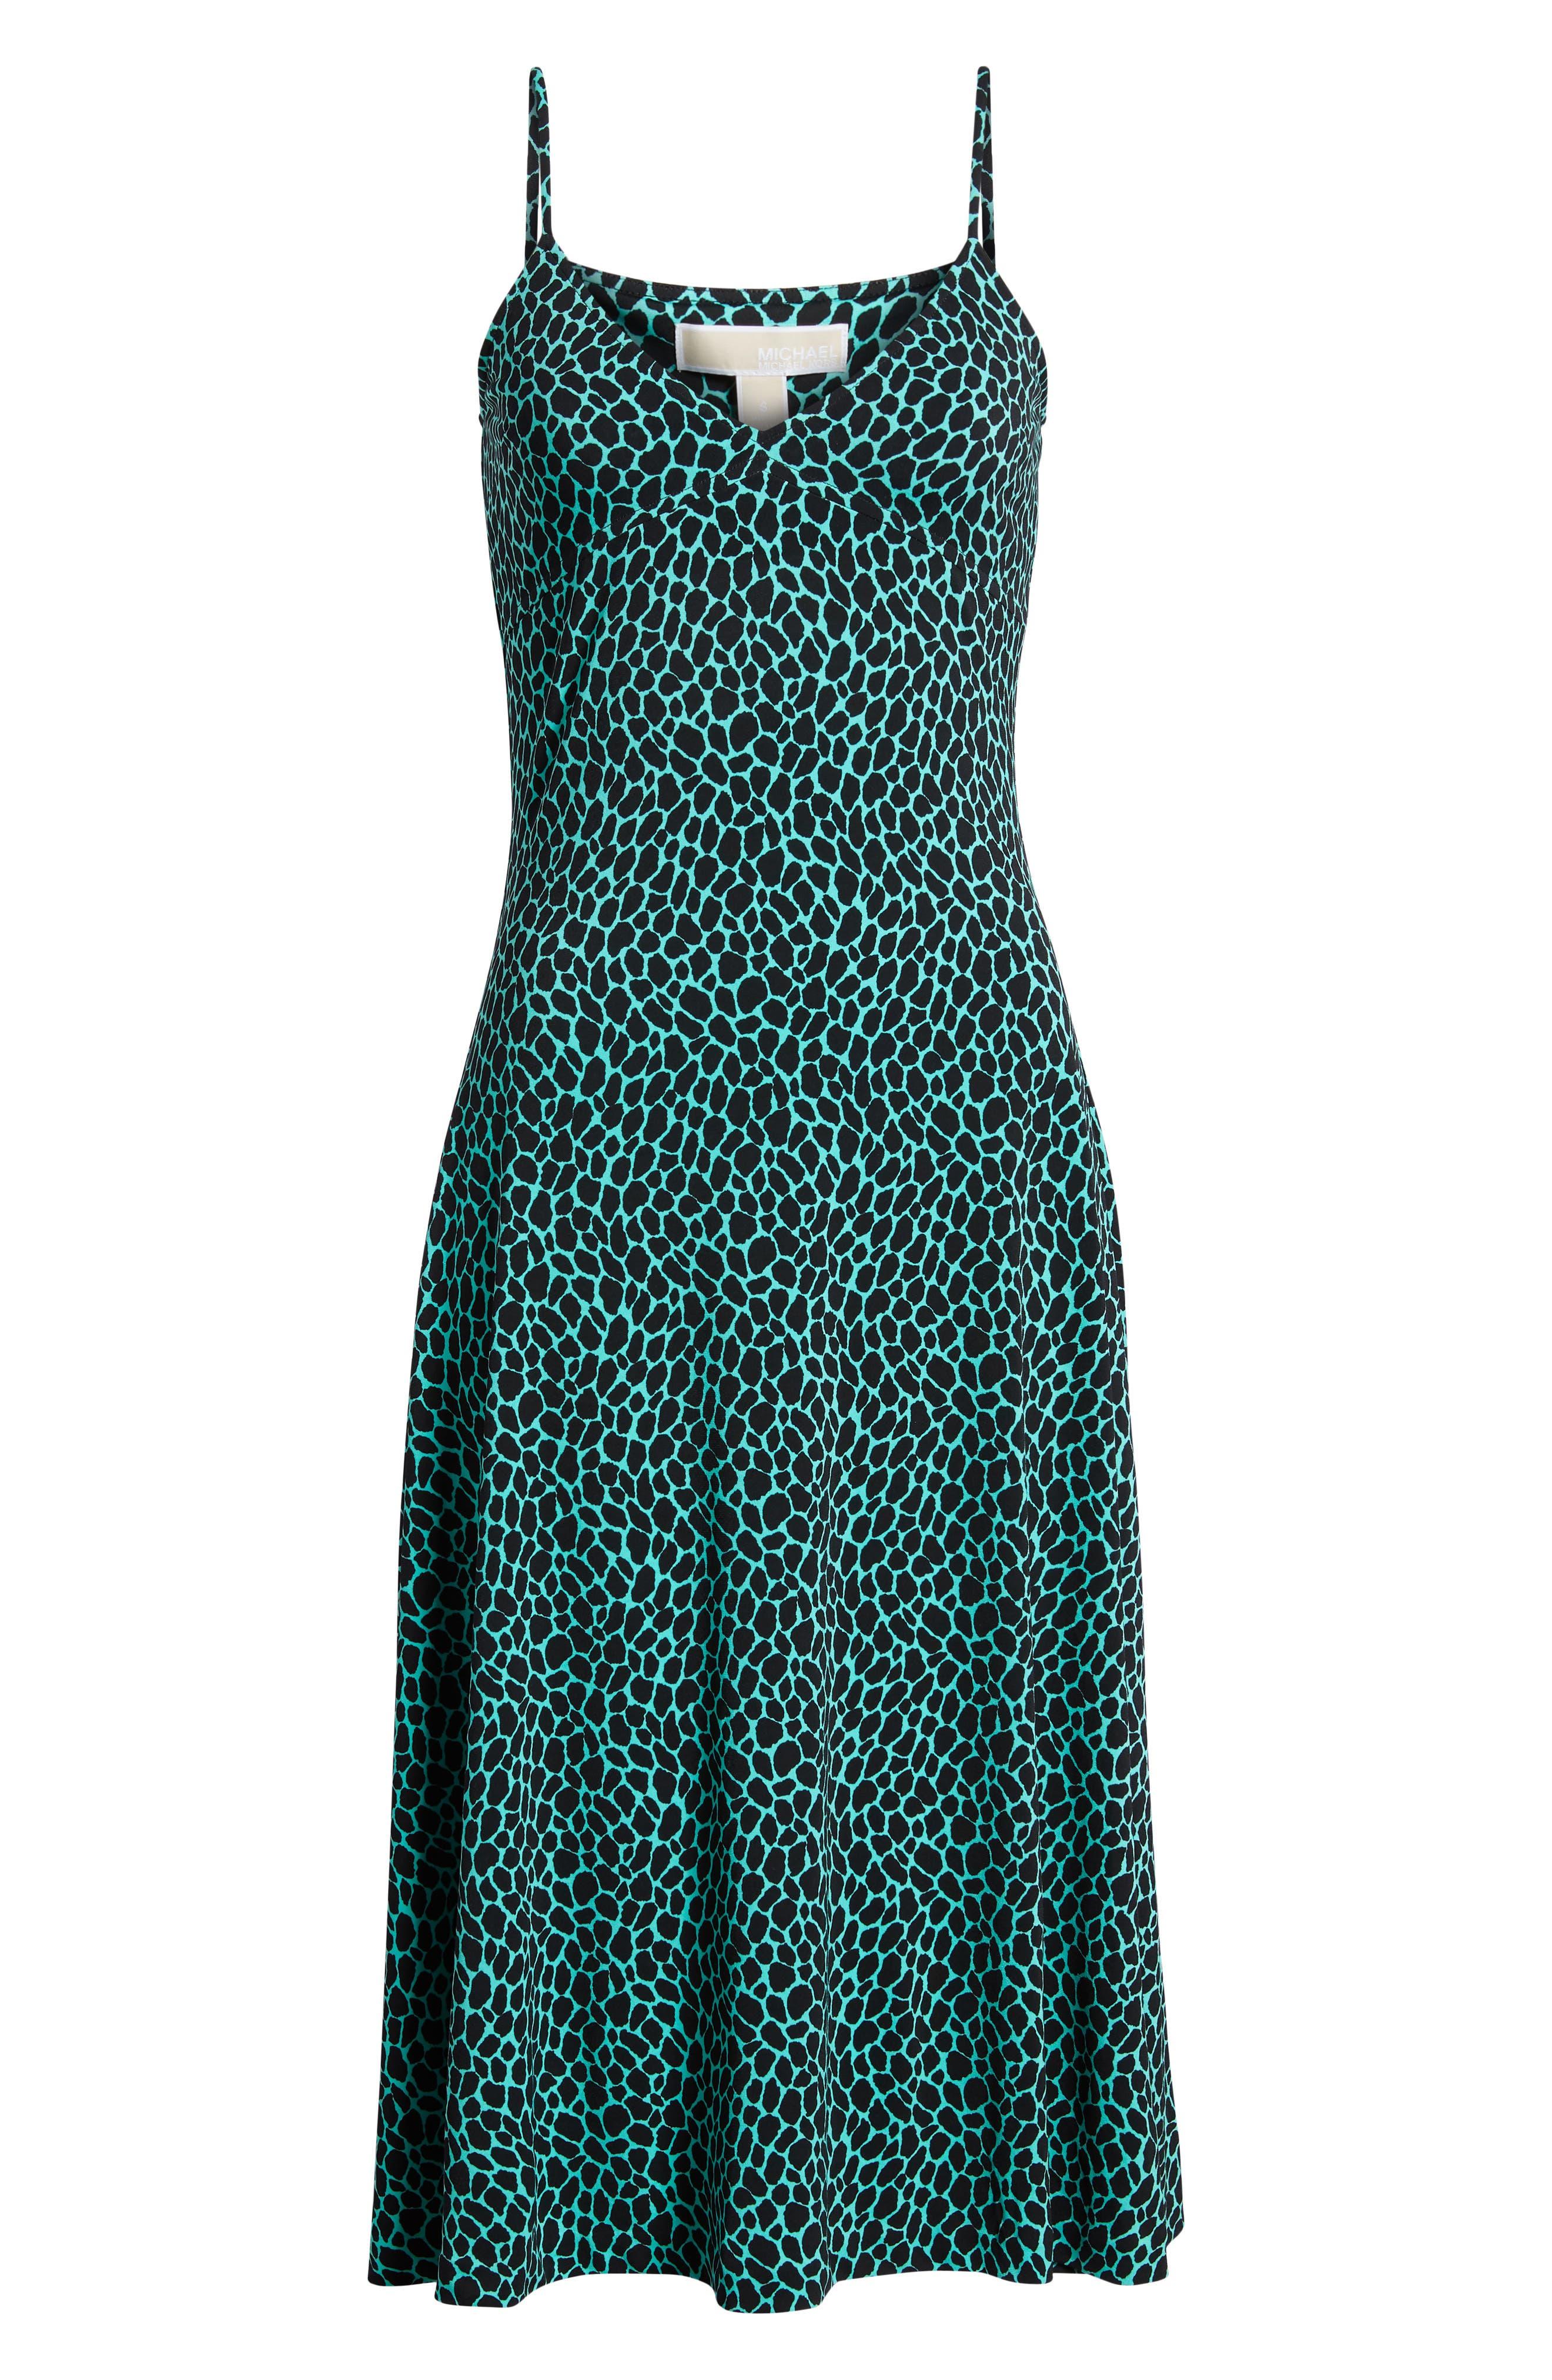 Graphic Leopard Tank Midi Dress,                             Alternate thumbnail 7, color,                             Aqua/ Black